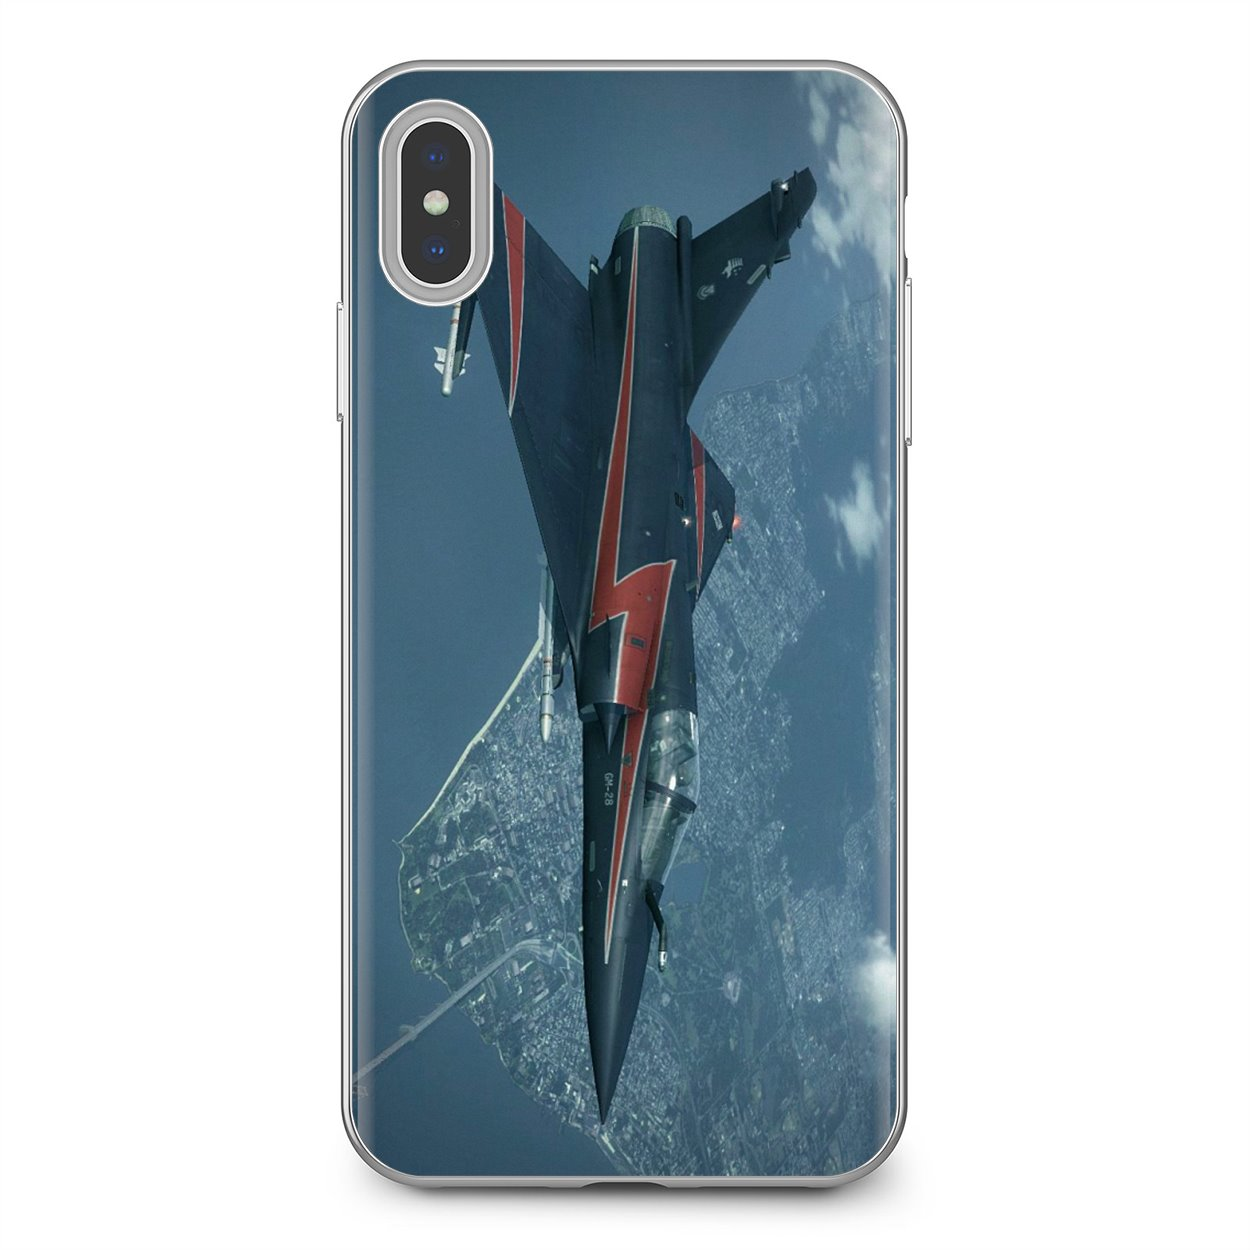 Mirage 2000 aeronaves força aérea para bq aquaris c u2 u v x2 x lite pro plus e4.5 m4.5 x5 e5 4g m 2017 cartaz de silicone caso telefone